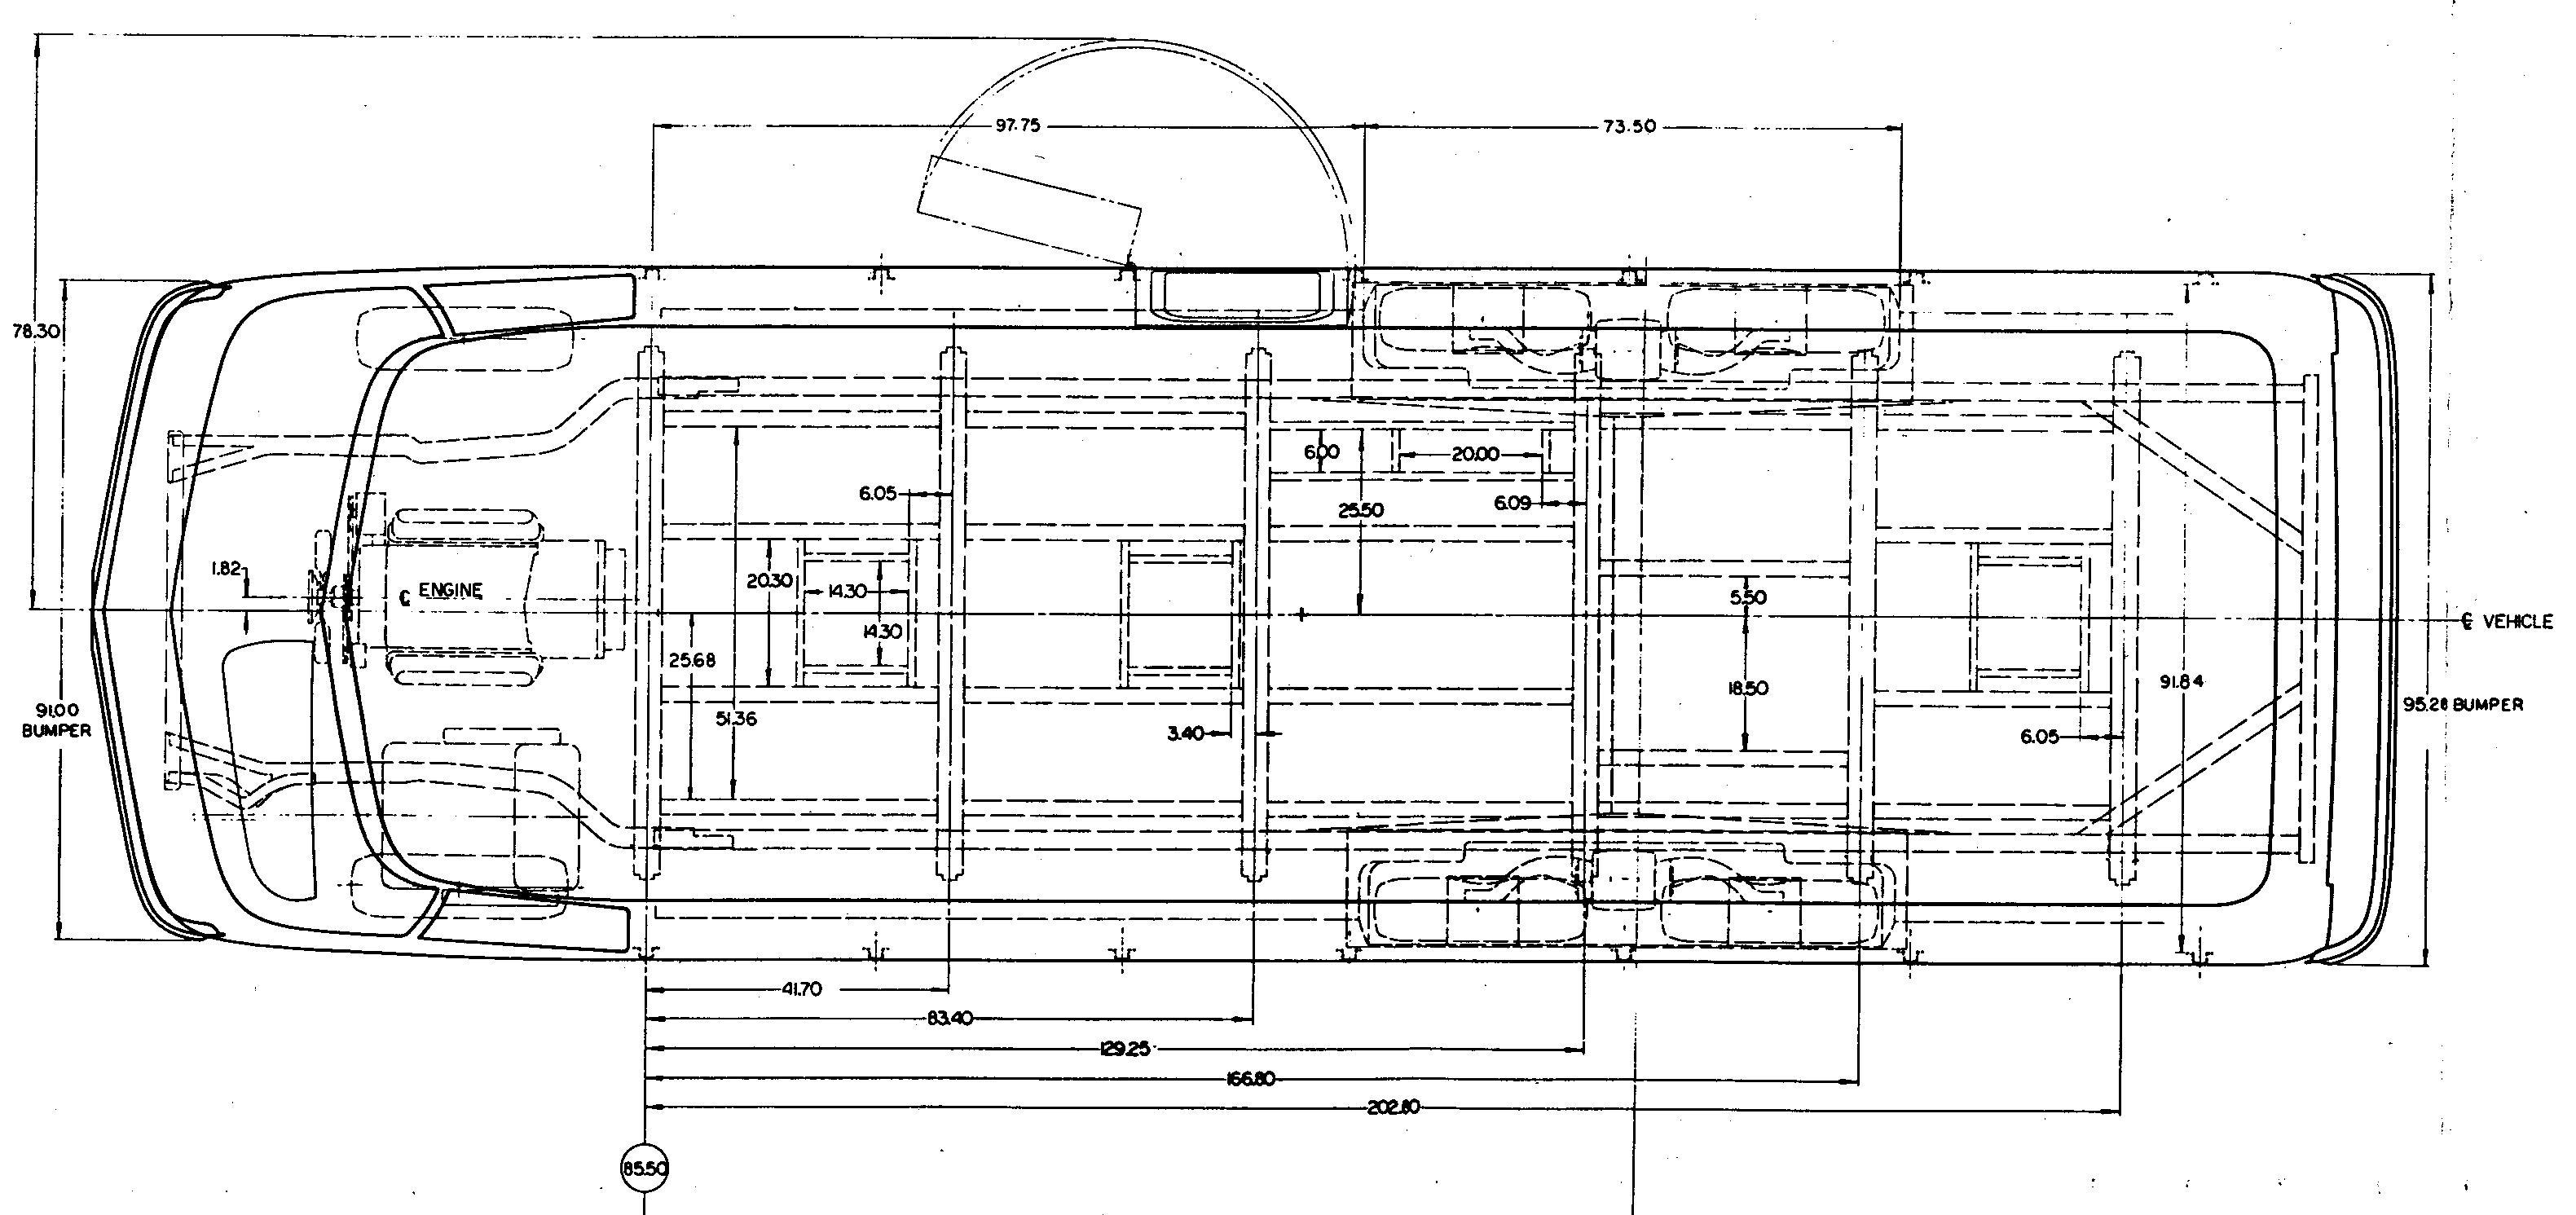 GMC Motorhome blueprint